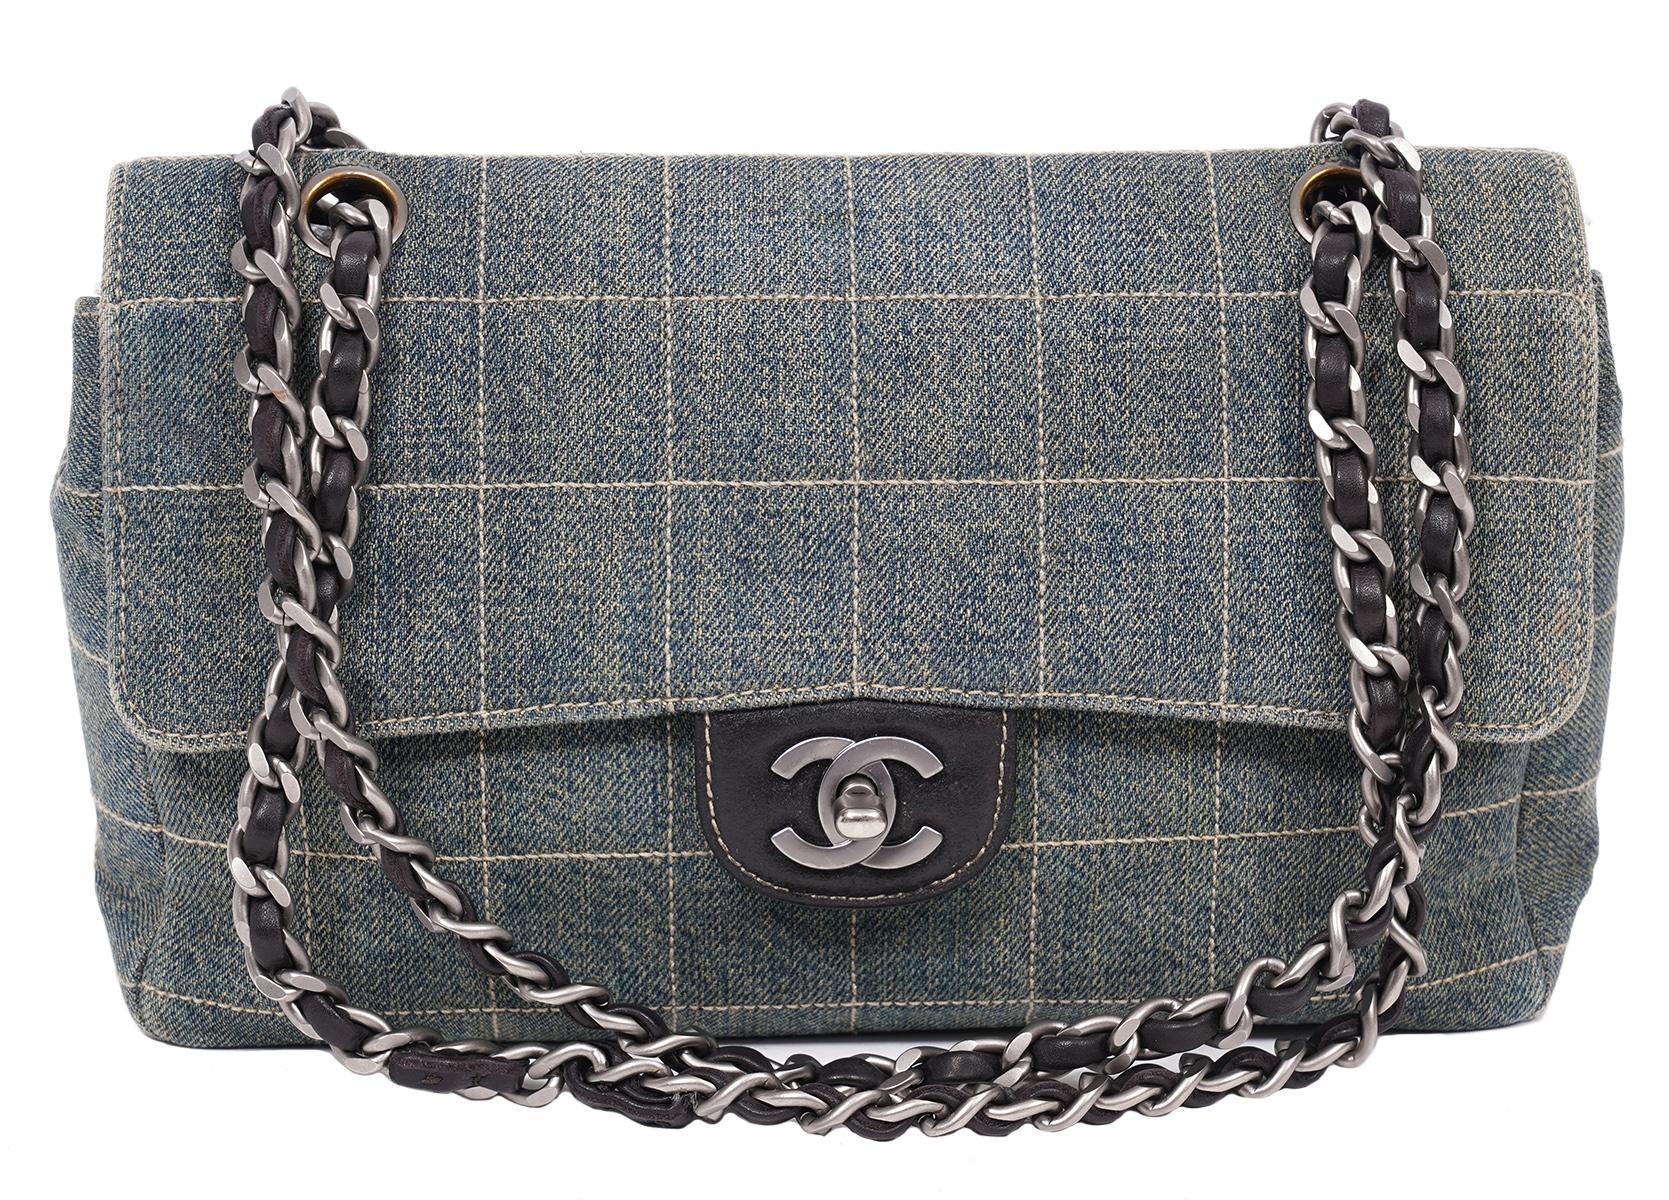 Vintage Chanel Denim Medium Classic 2000